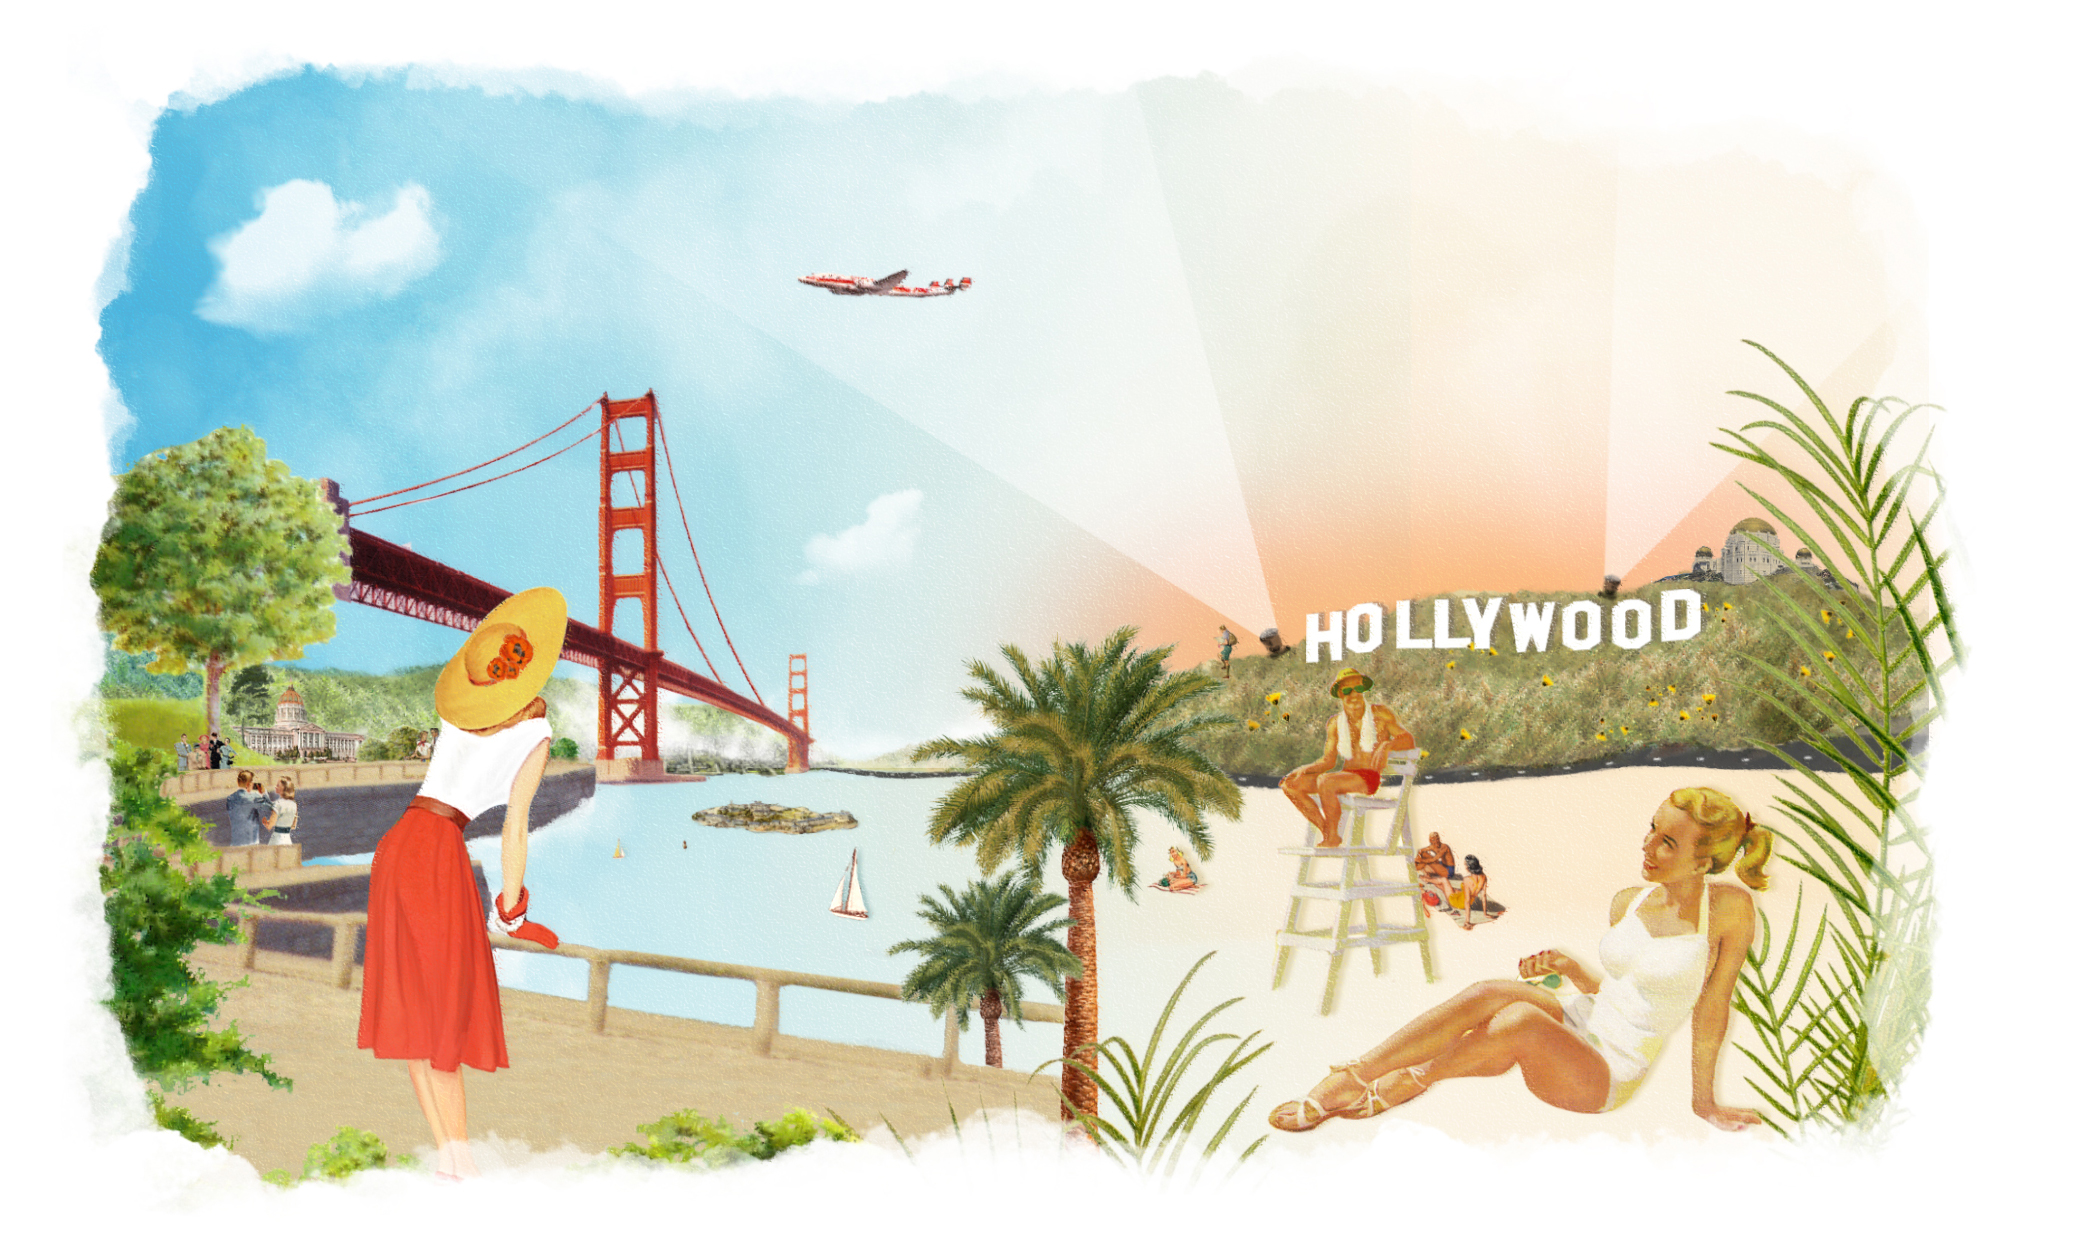 The Myth and Magic of California Style